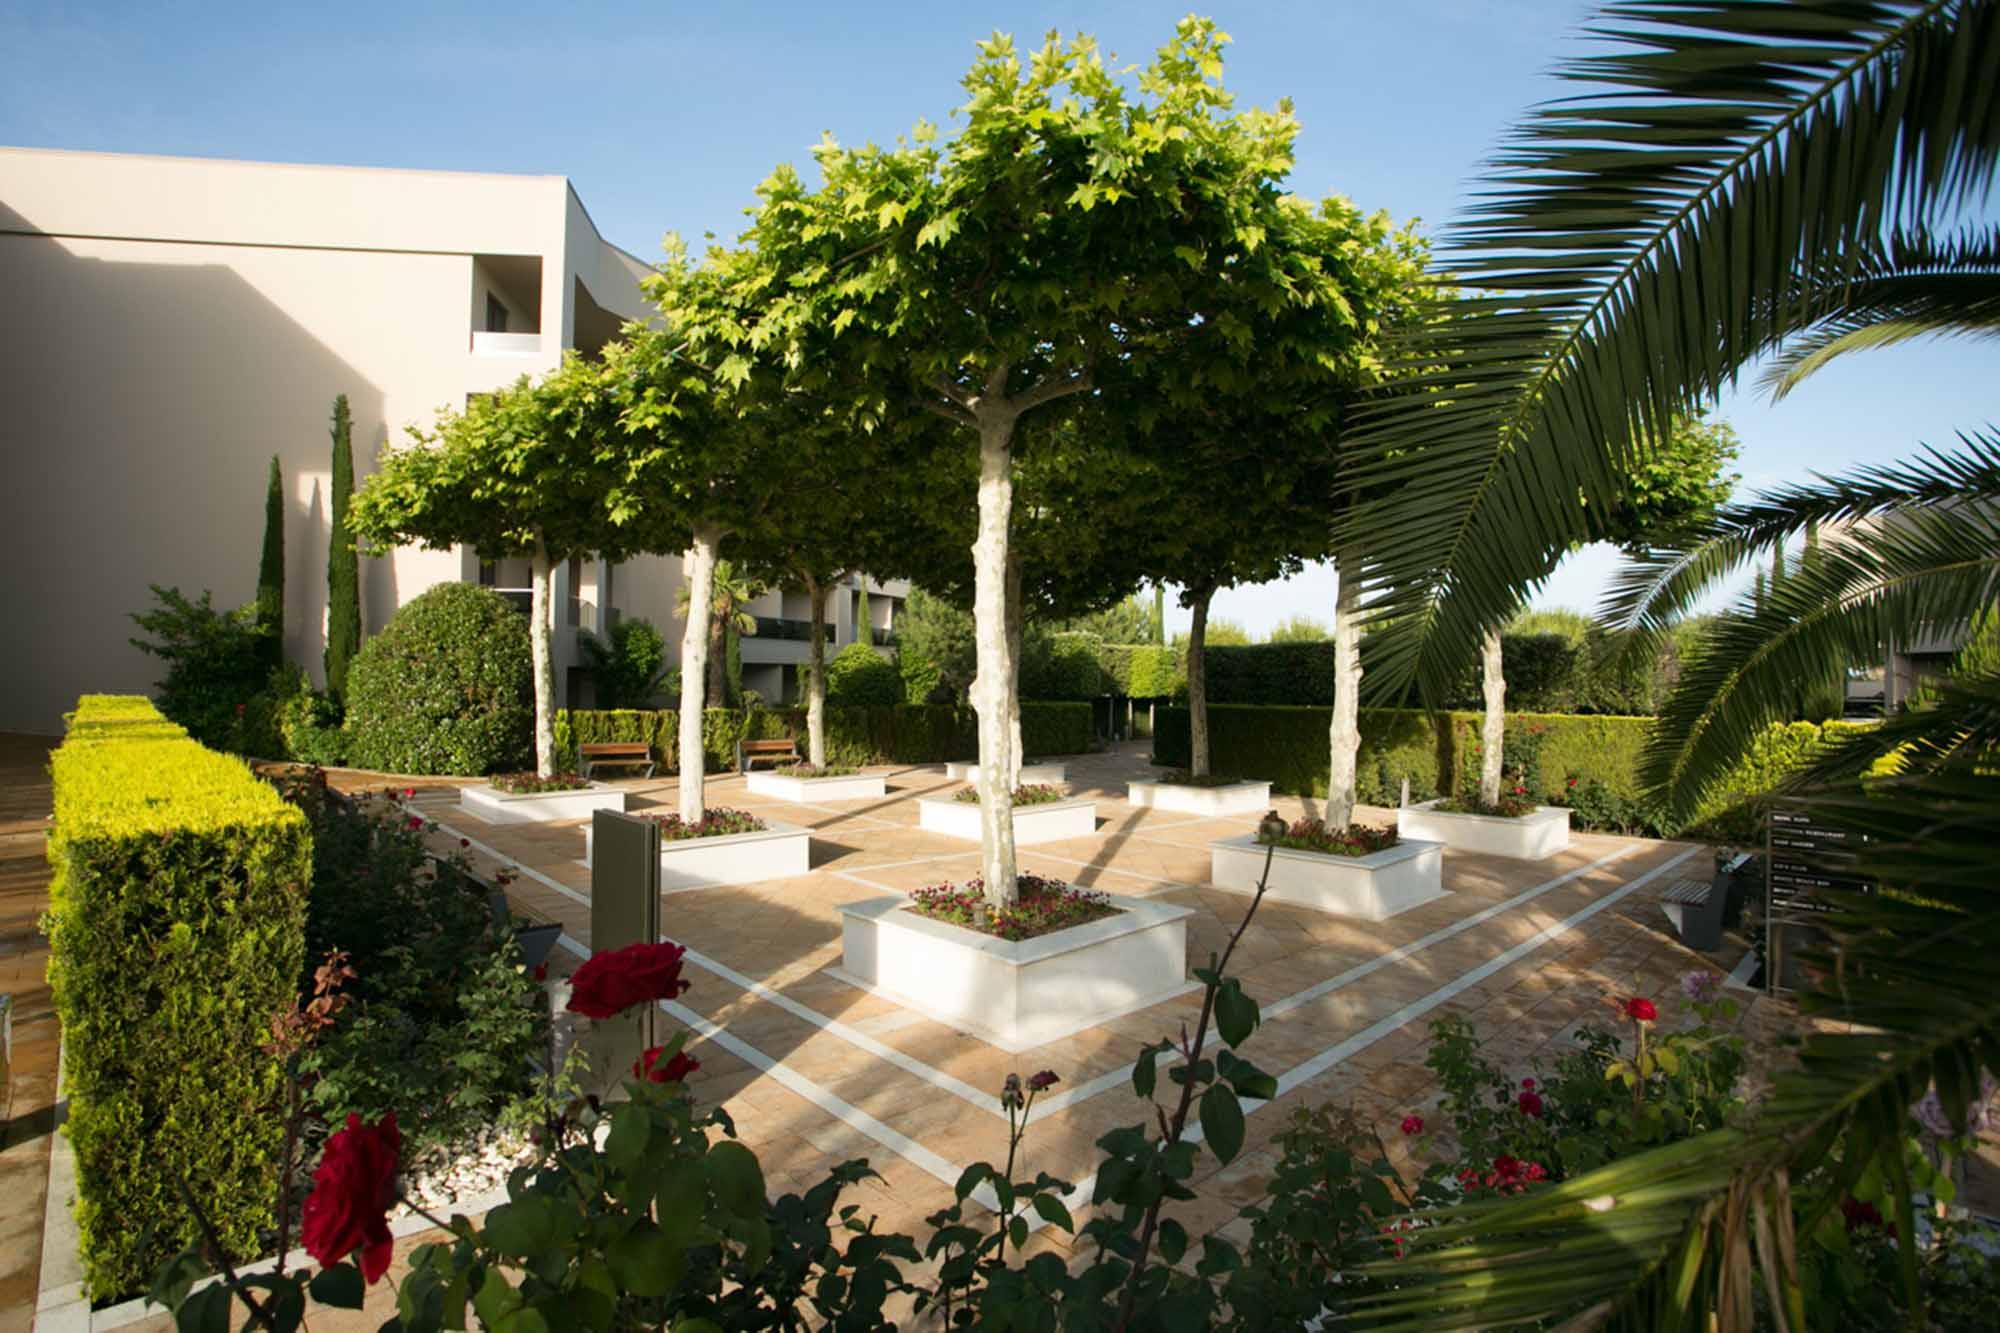 Platanus Garden